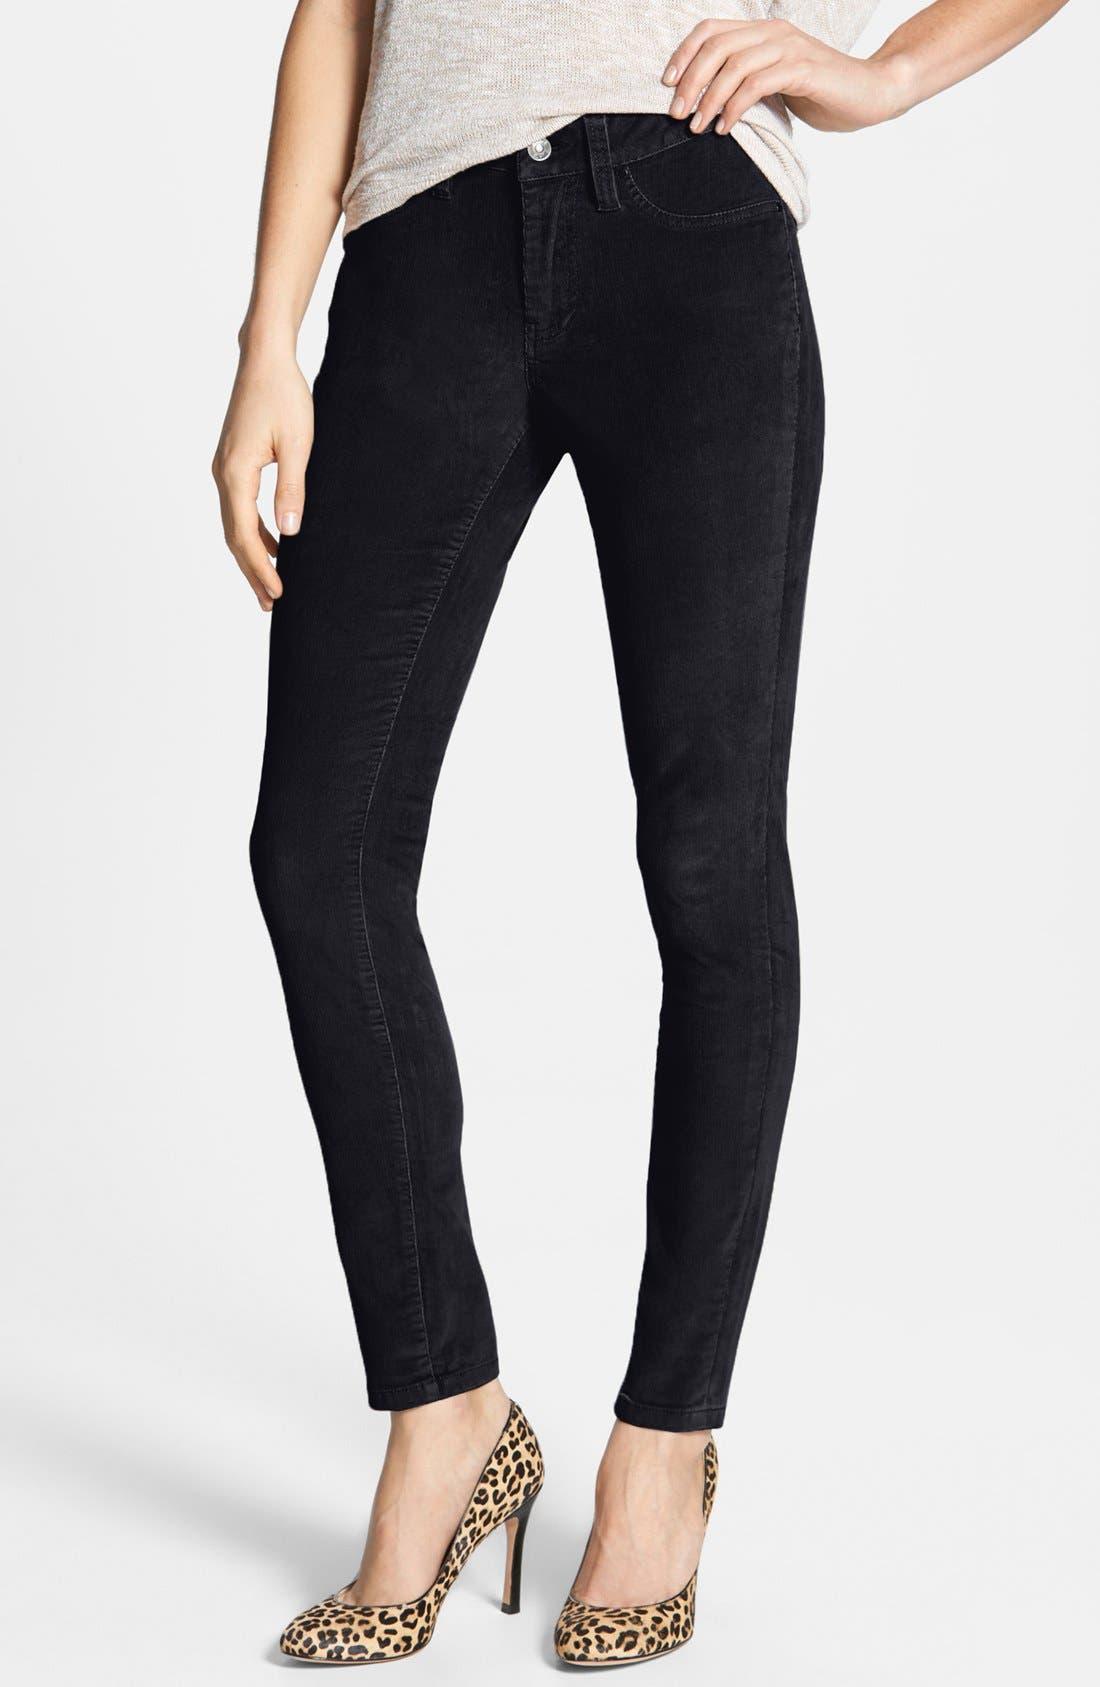 Alternate Image 1 Selected - Jag Jeans 'Olivia' Corduroy Leggings (Petite)